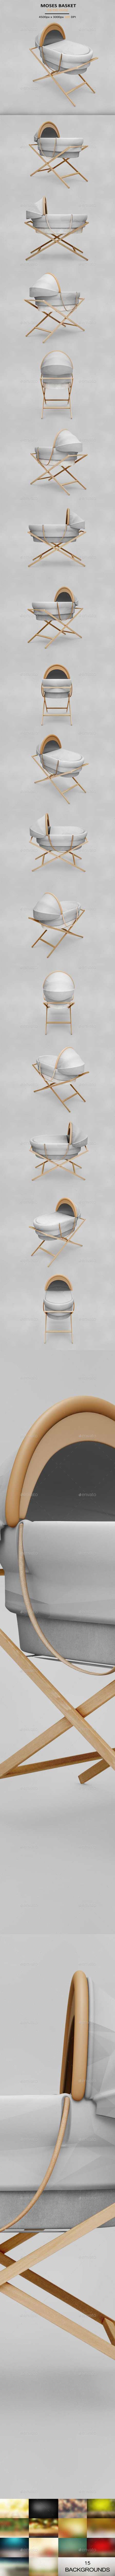 Moses Basket MockUp - Product Mock-Ups Graphics